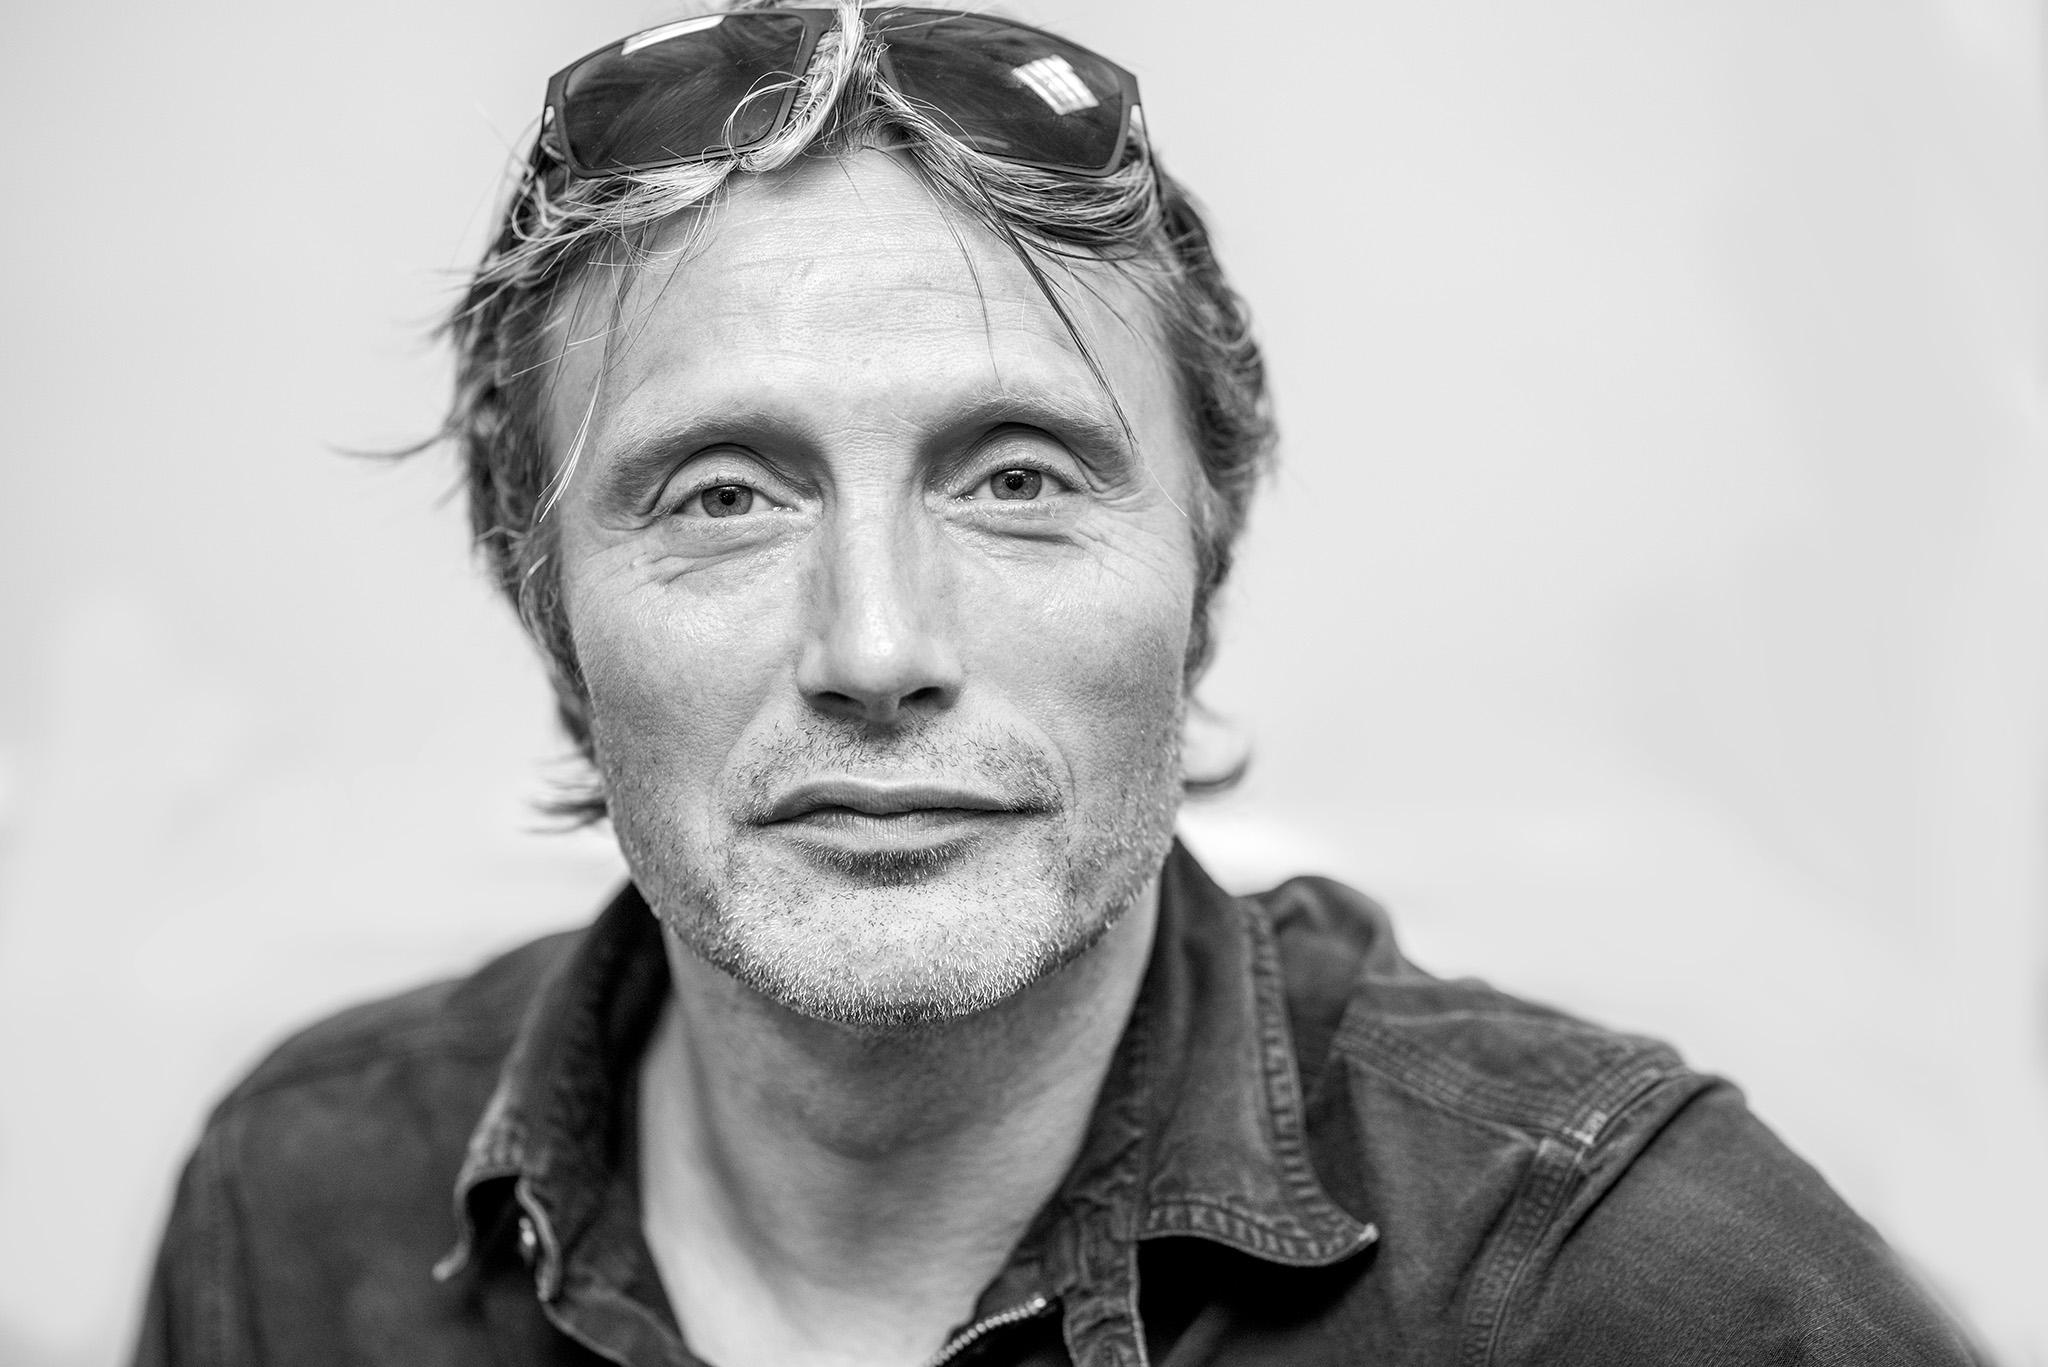 Mads Mikkelsen portrait by Tony Urban